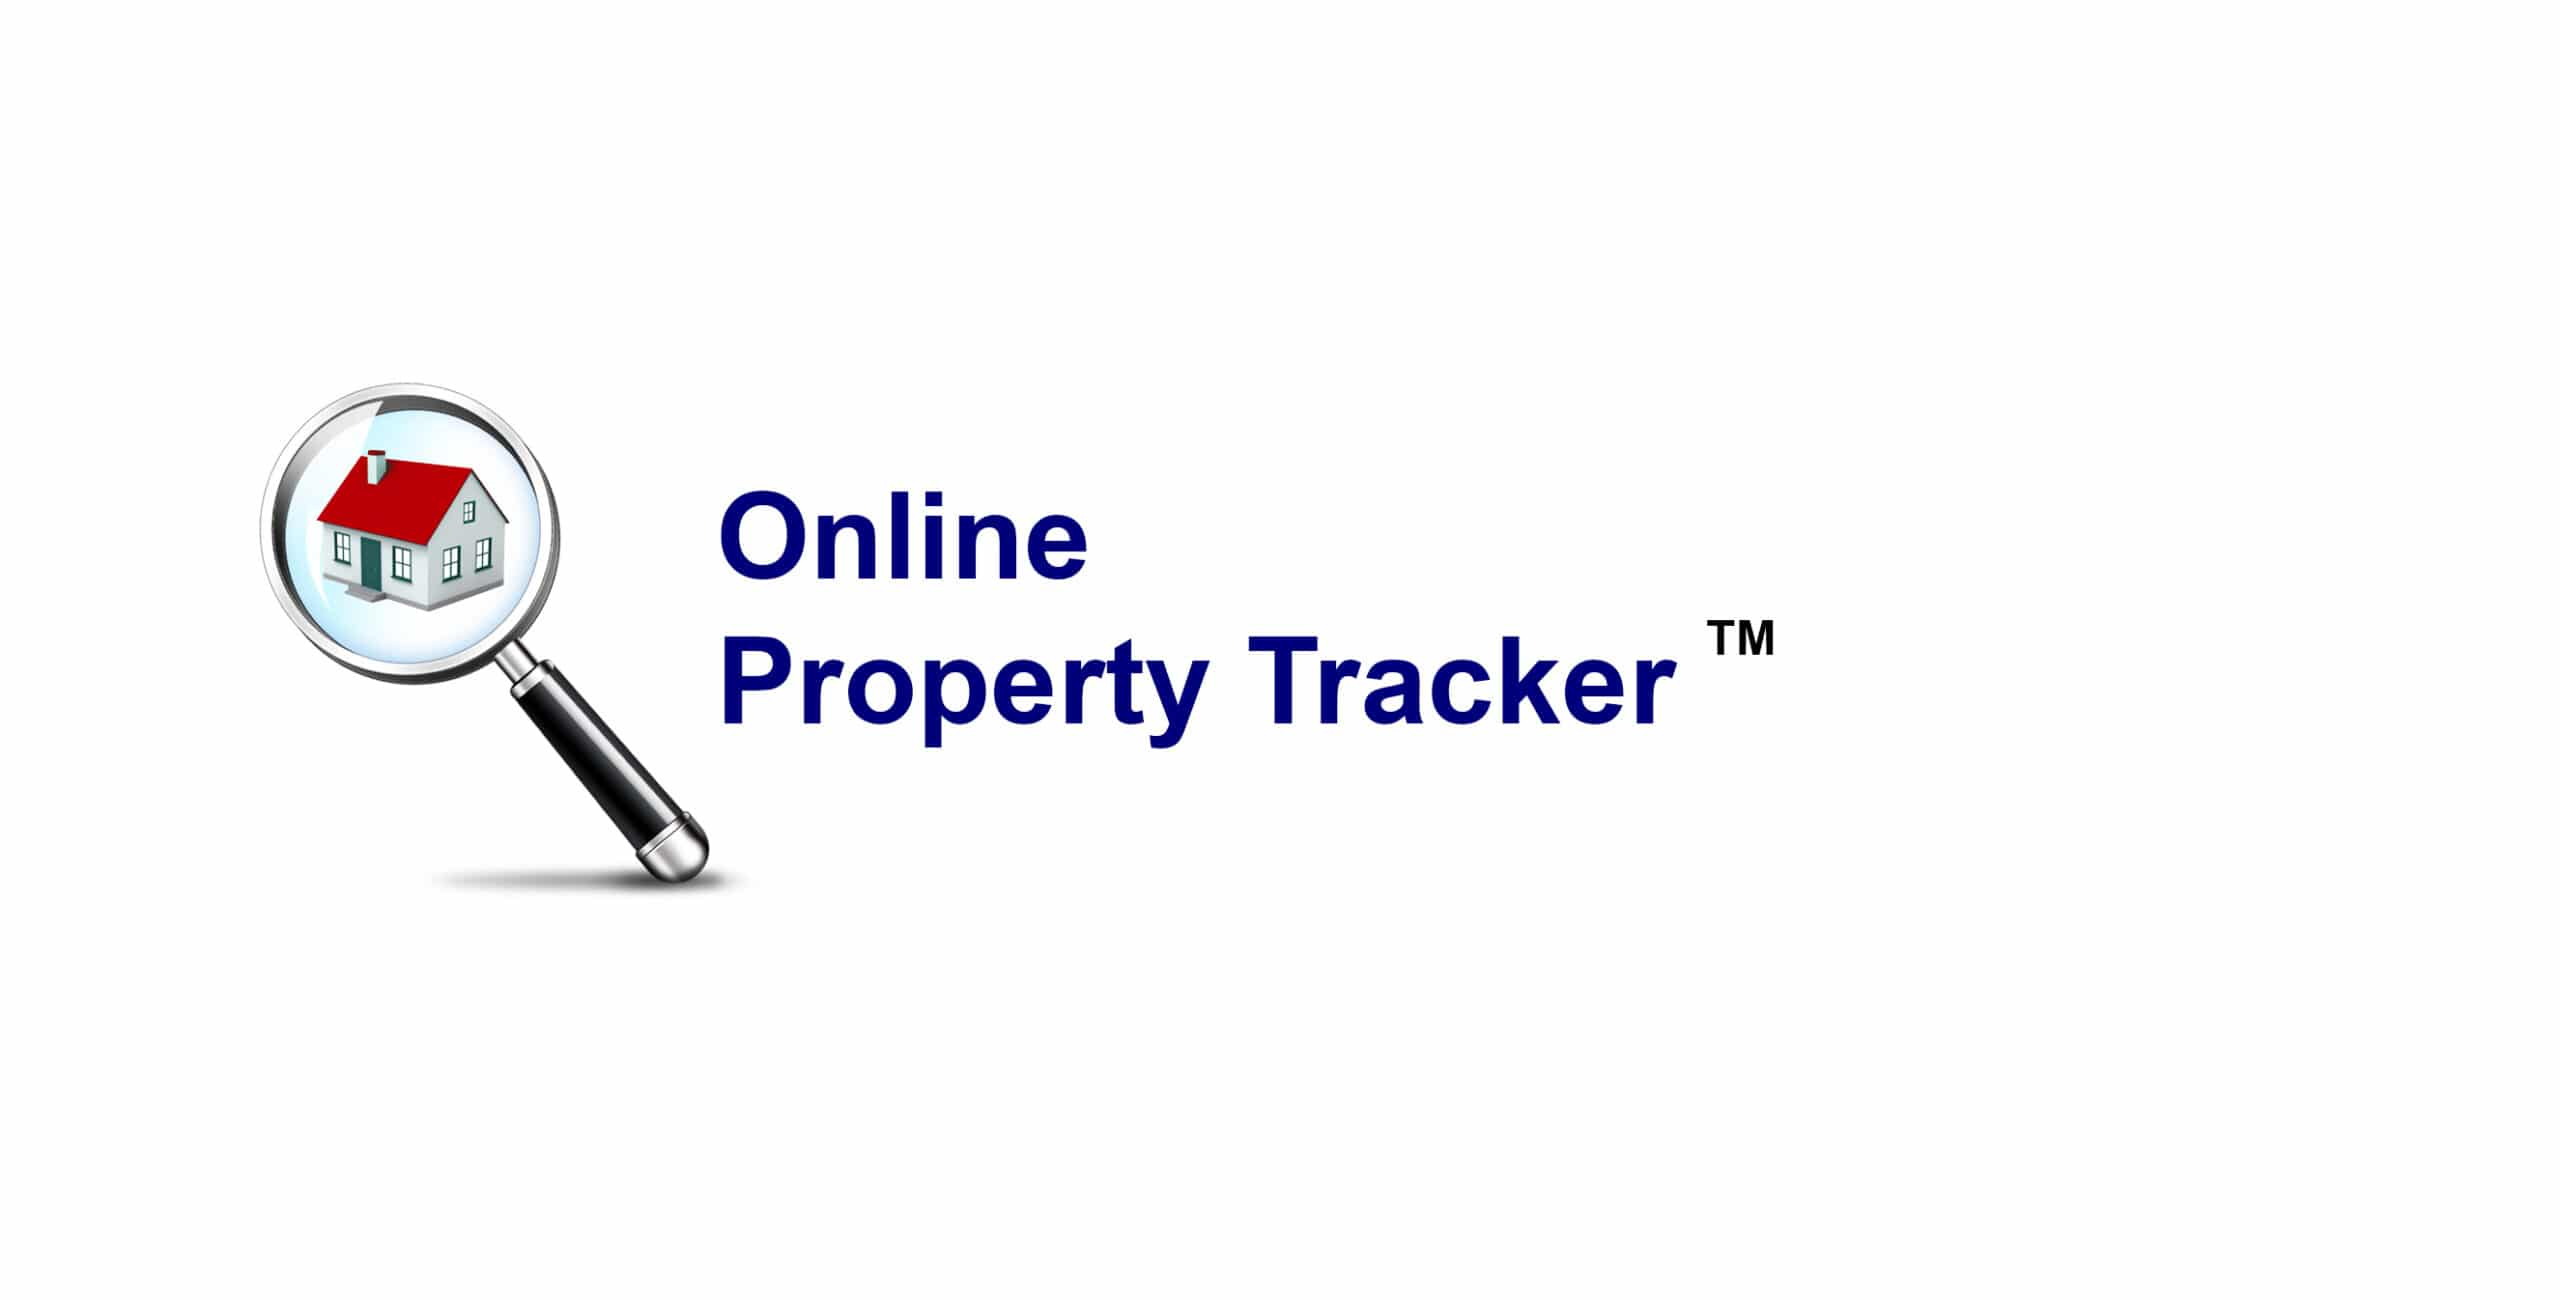 Online Property Tracker system